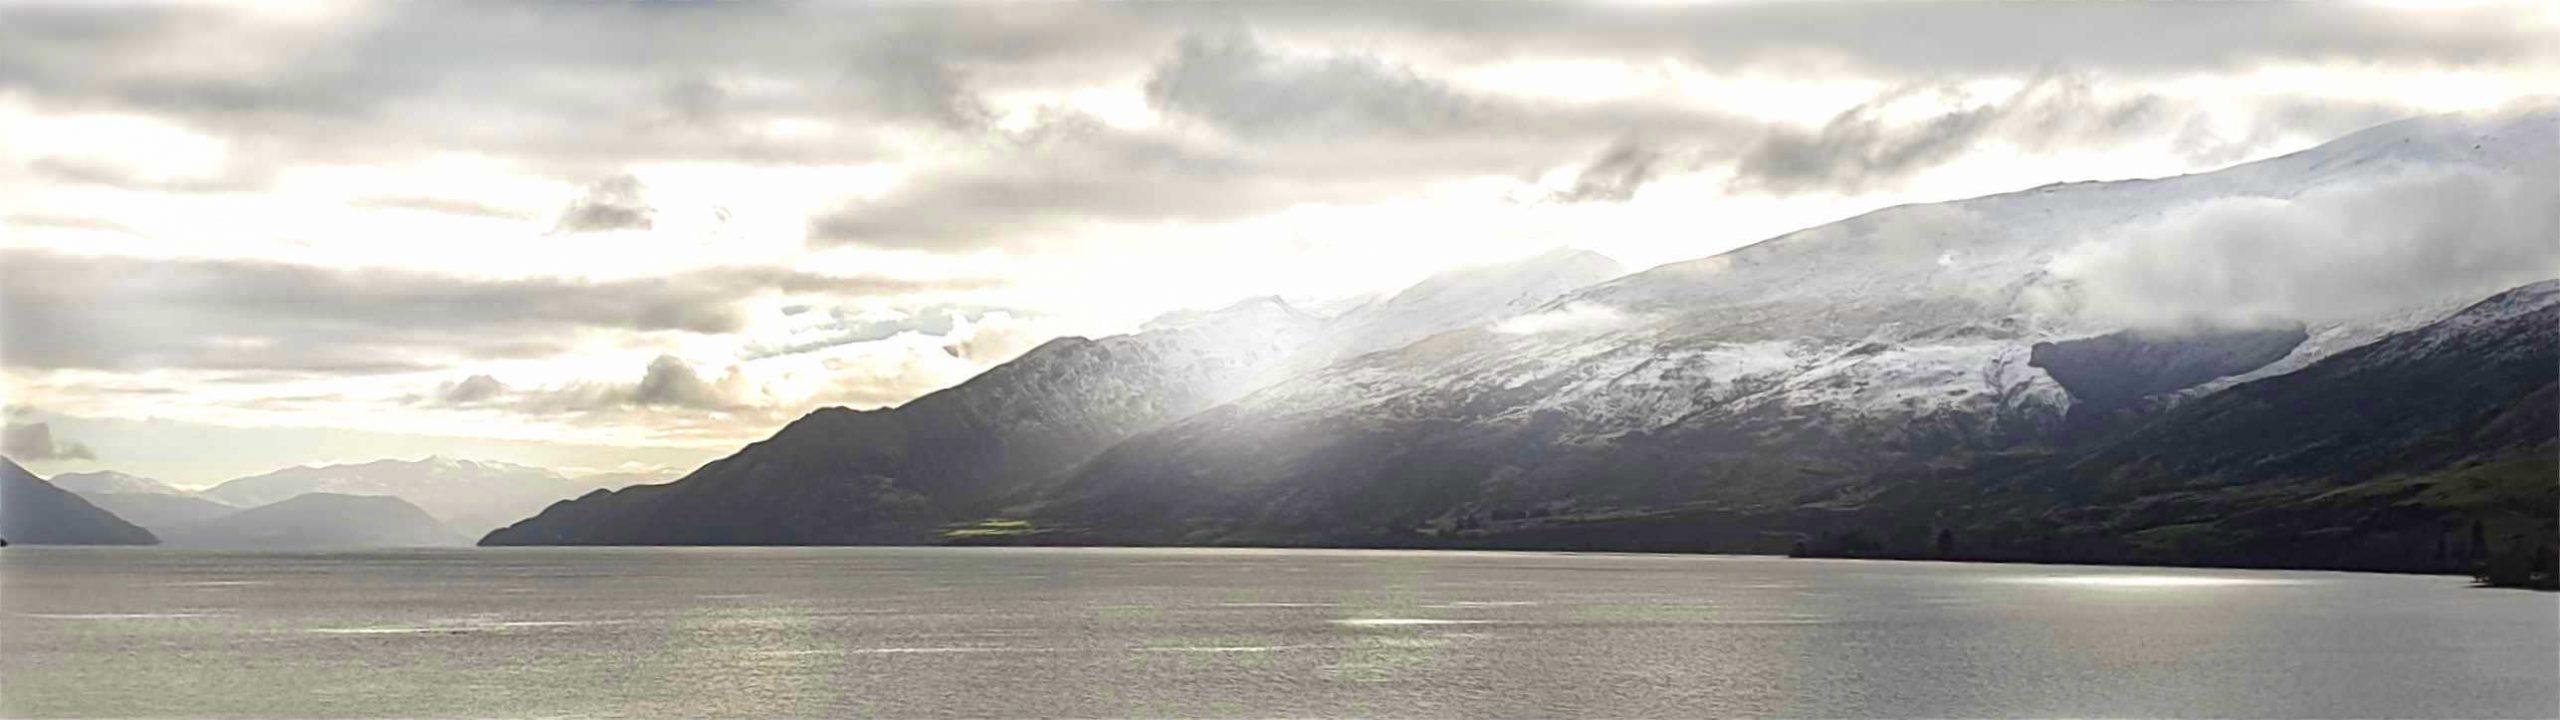 Lake Wakatipu, Southern Alps, Remarkable Ranges near Kingston